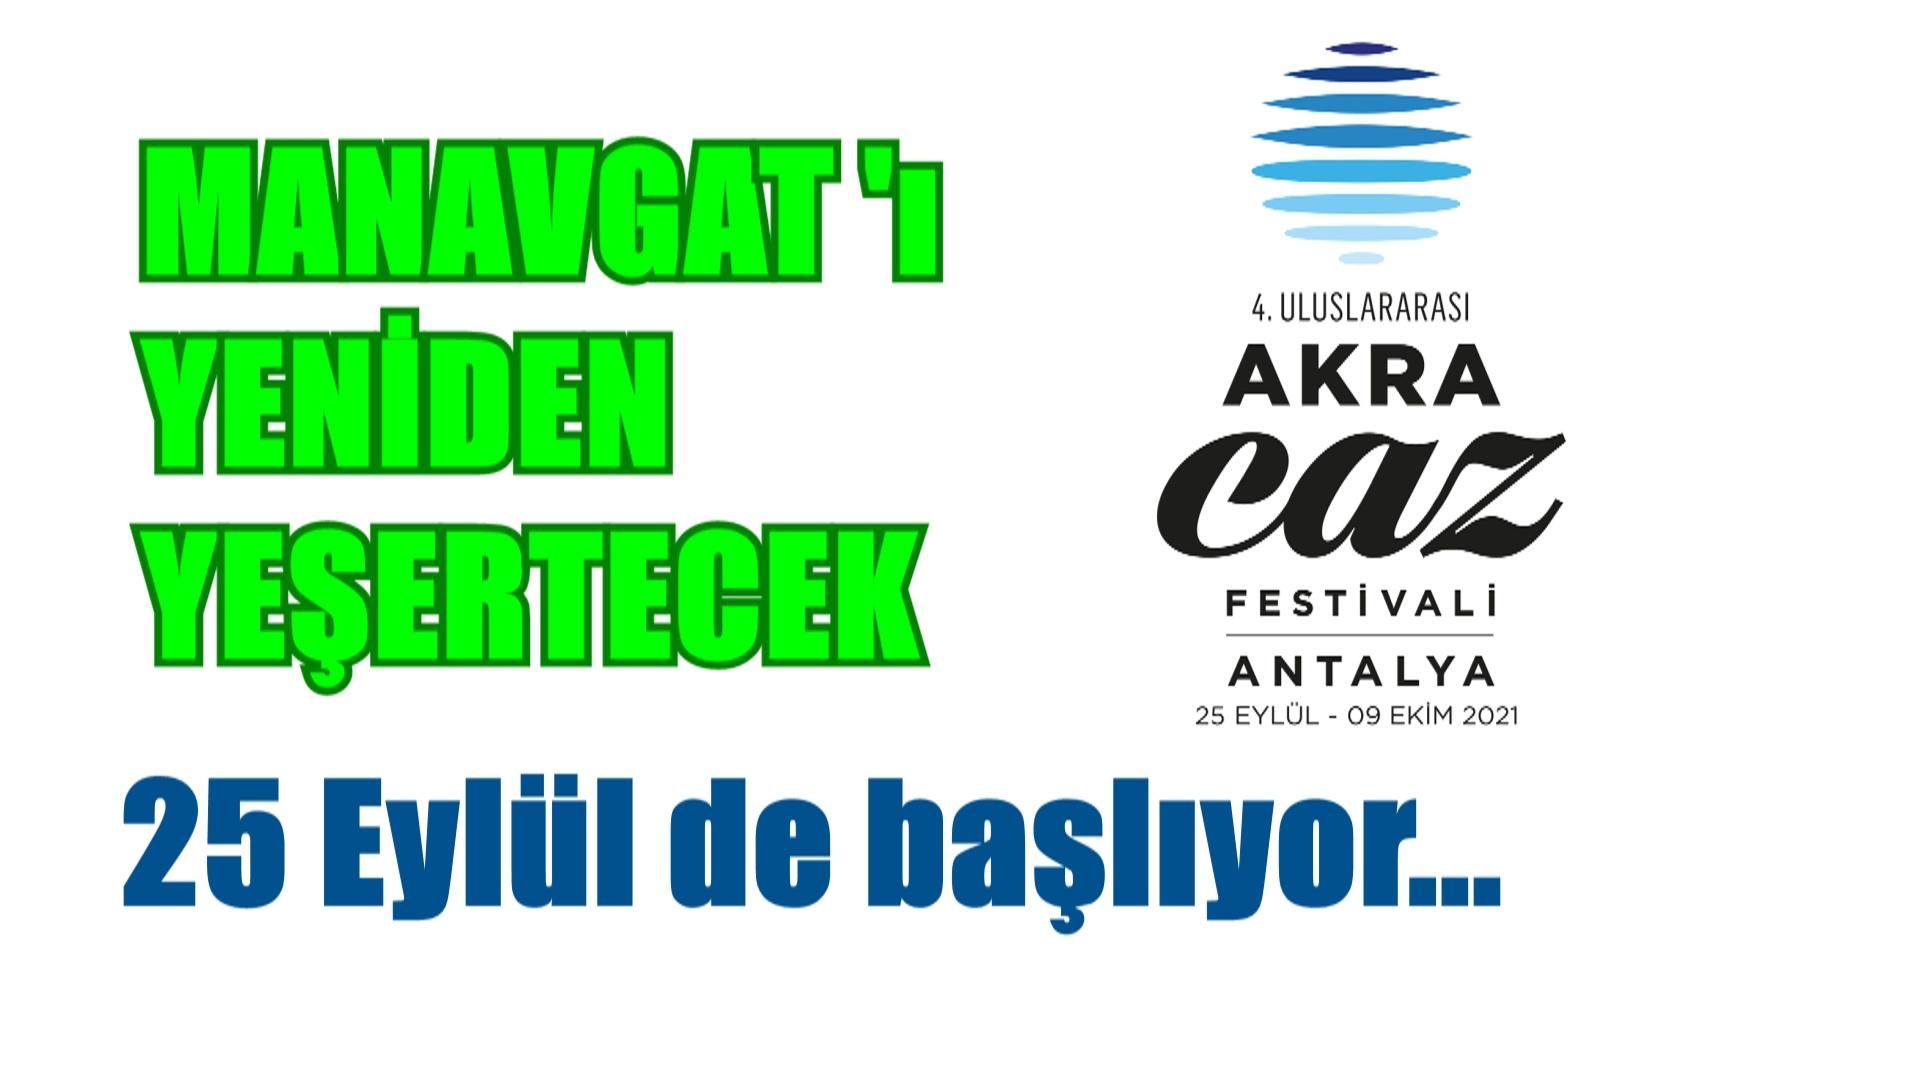 4. Antalya Akra Caz Festivali başlıyor